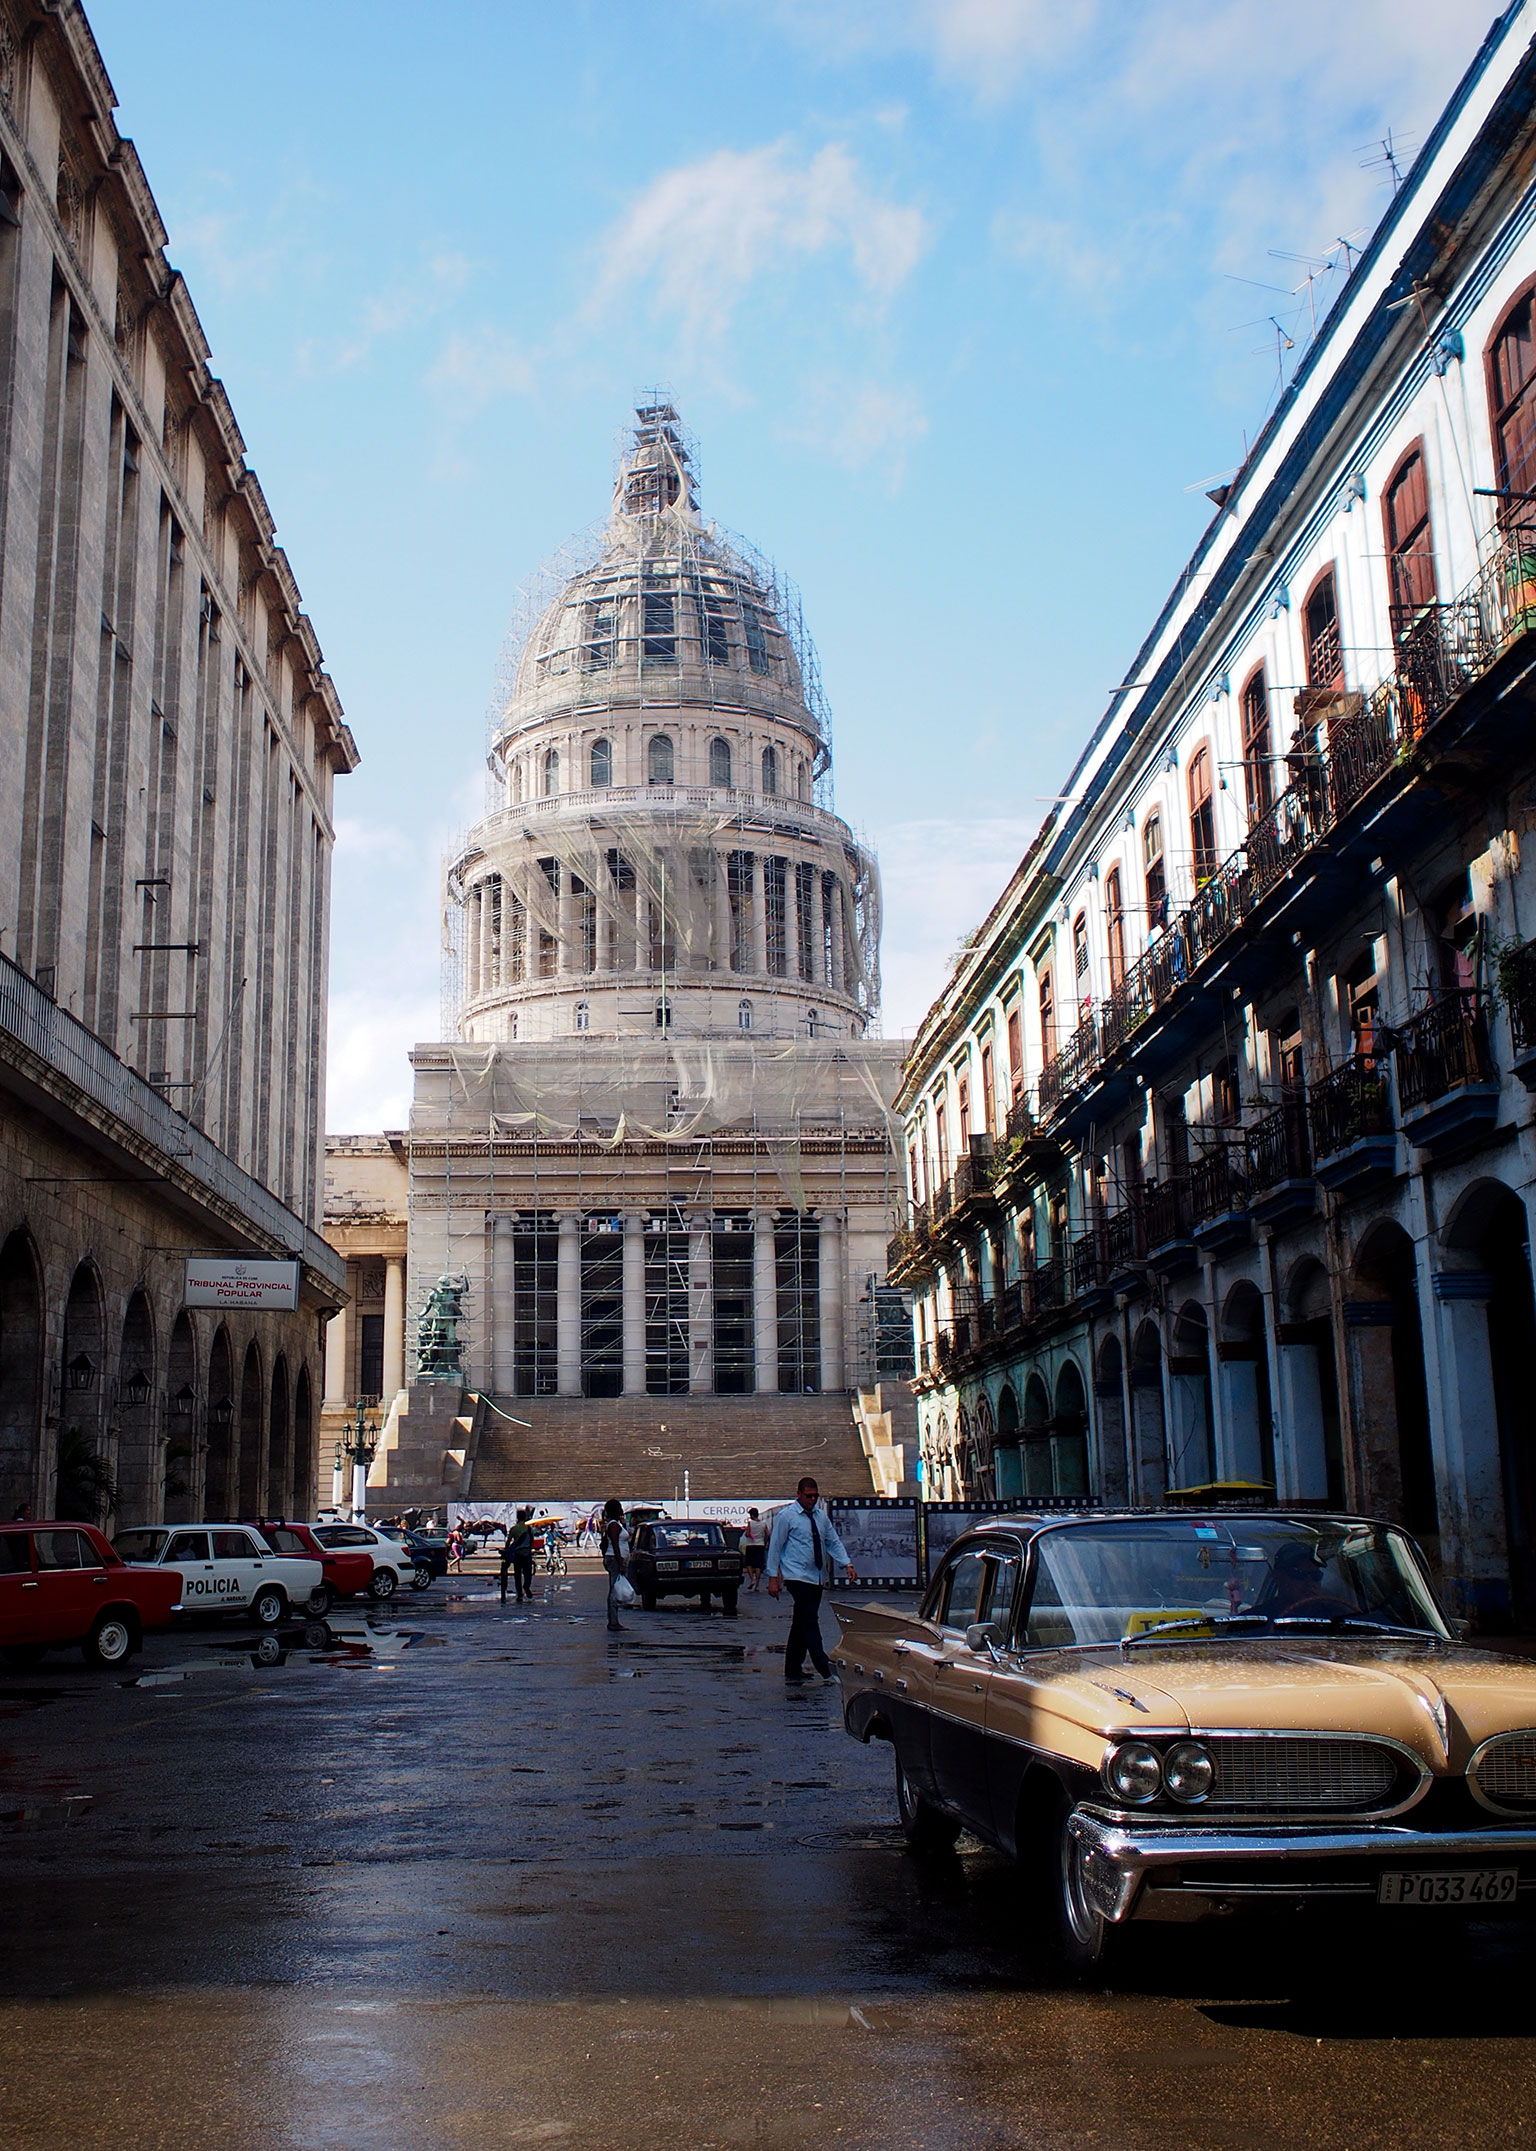 Photograph of Cuba by Harley Rustad